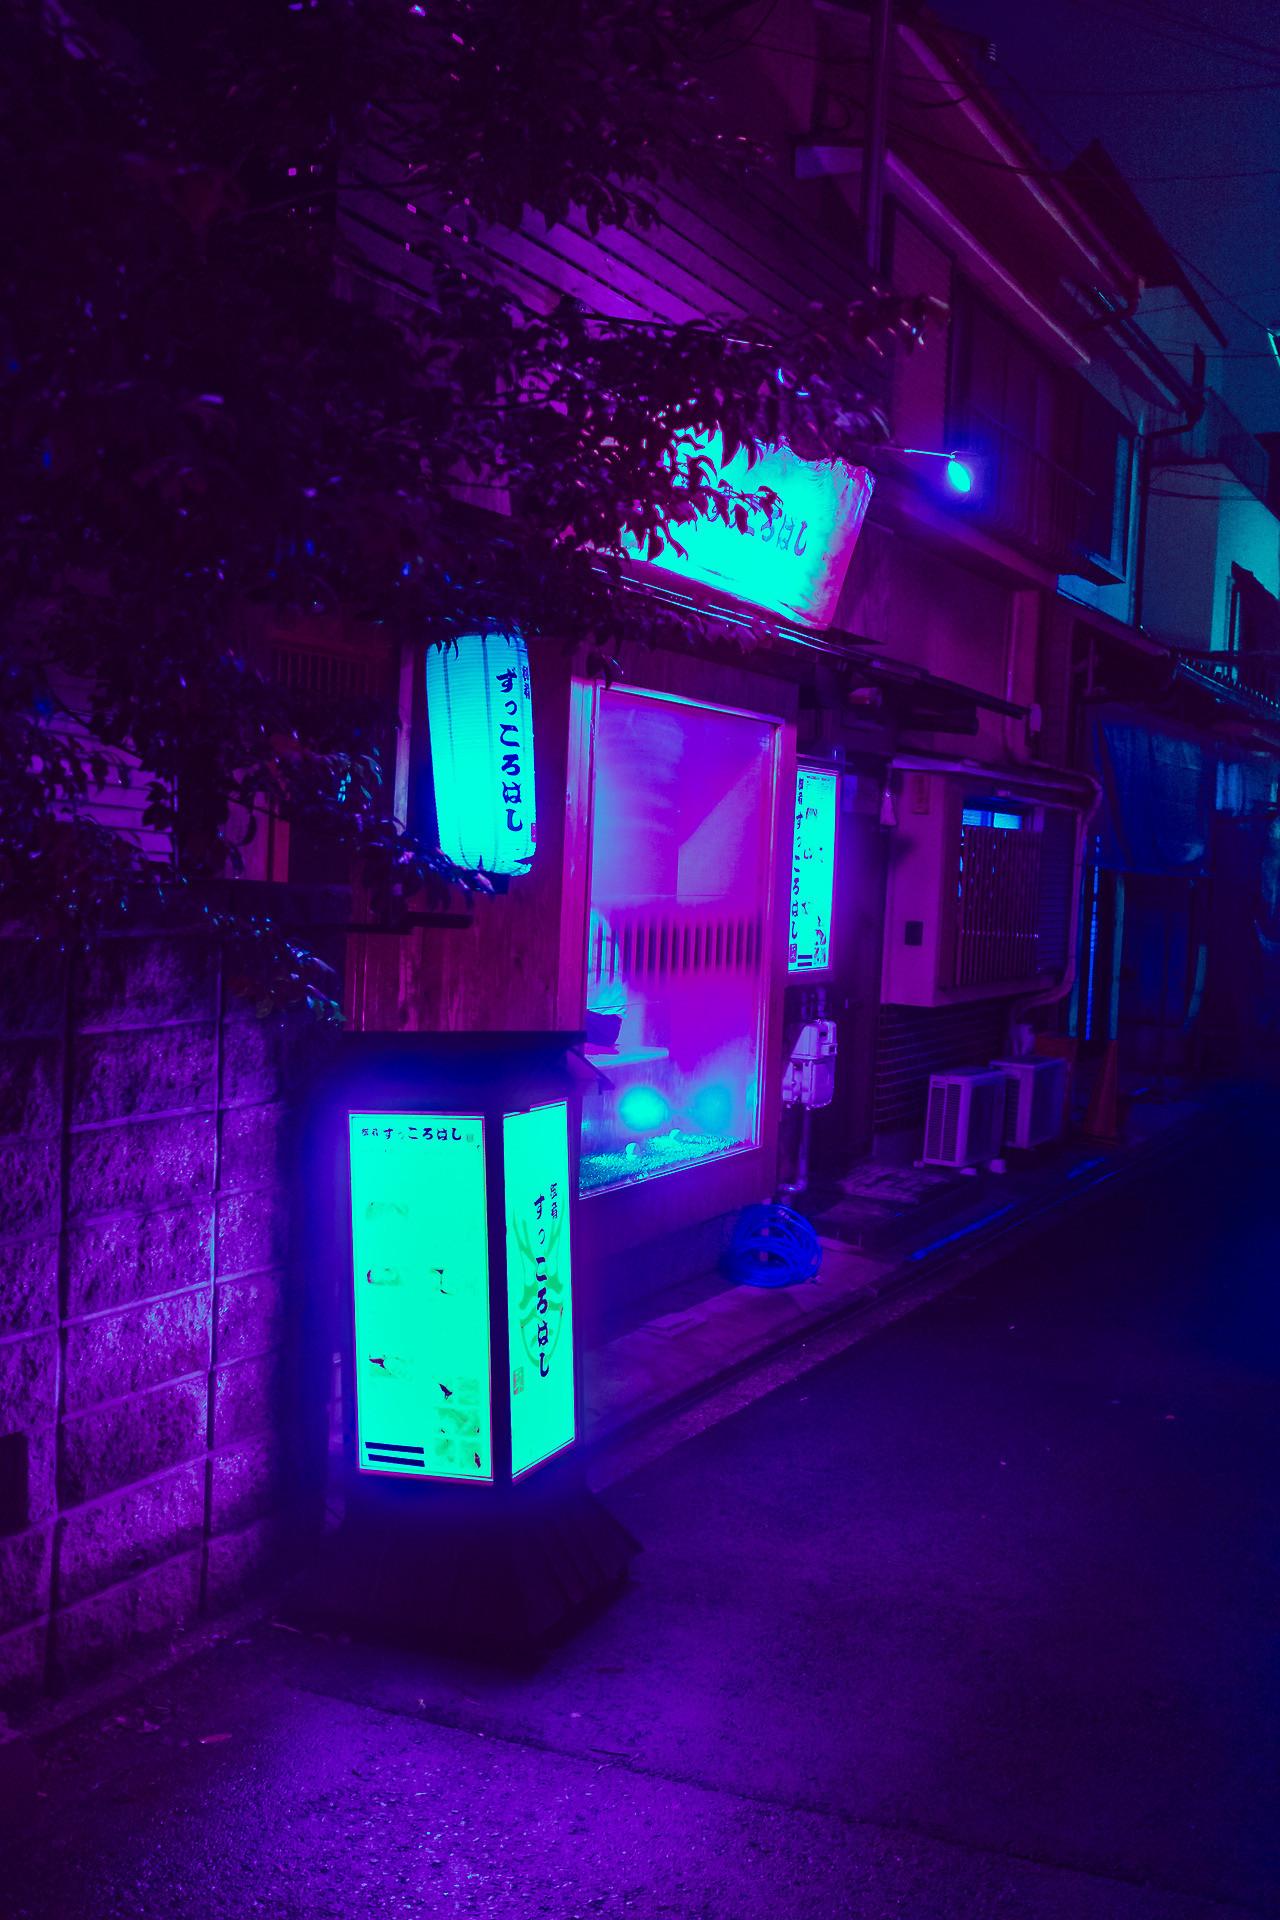 Tumblr Aesthetic Lights Wallpaper Novocom Top